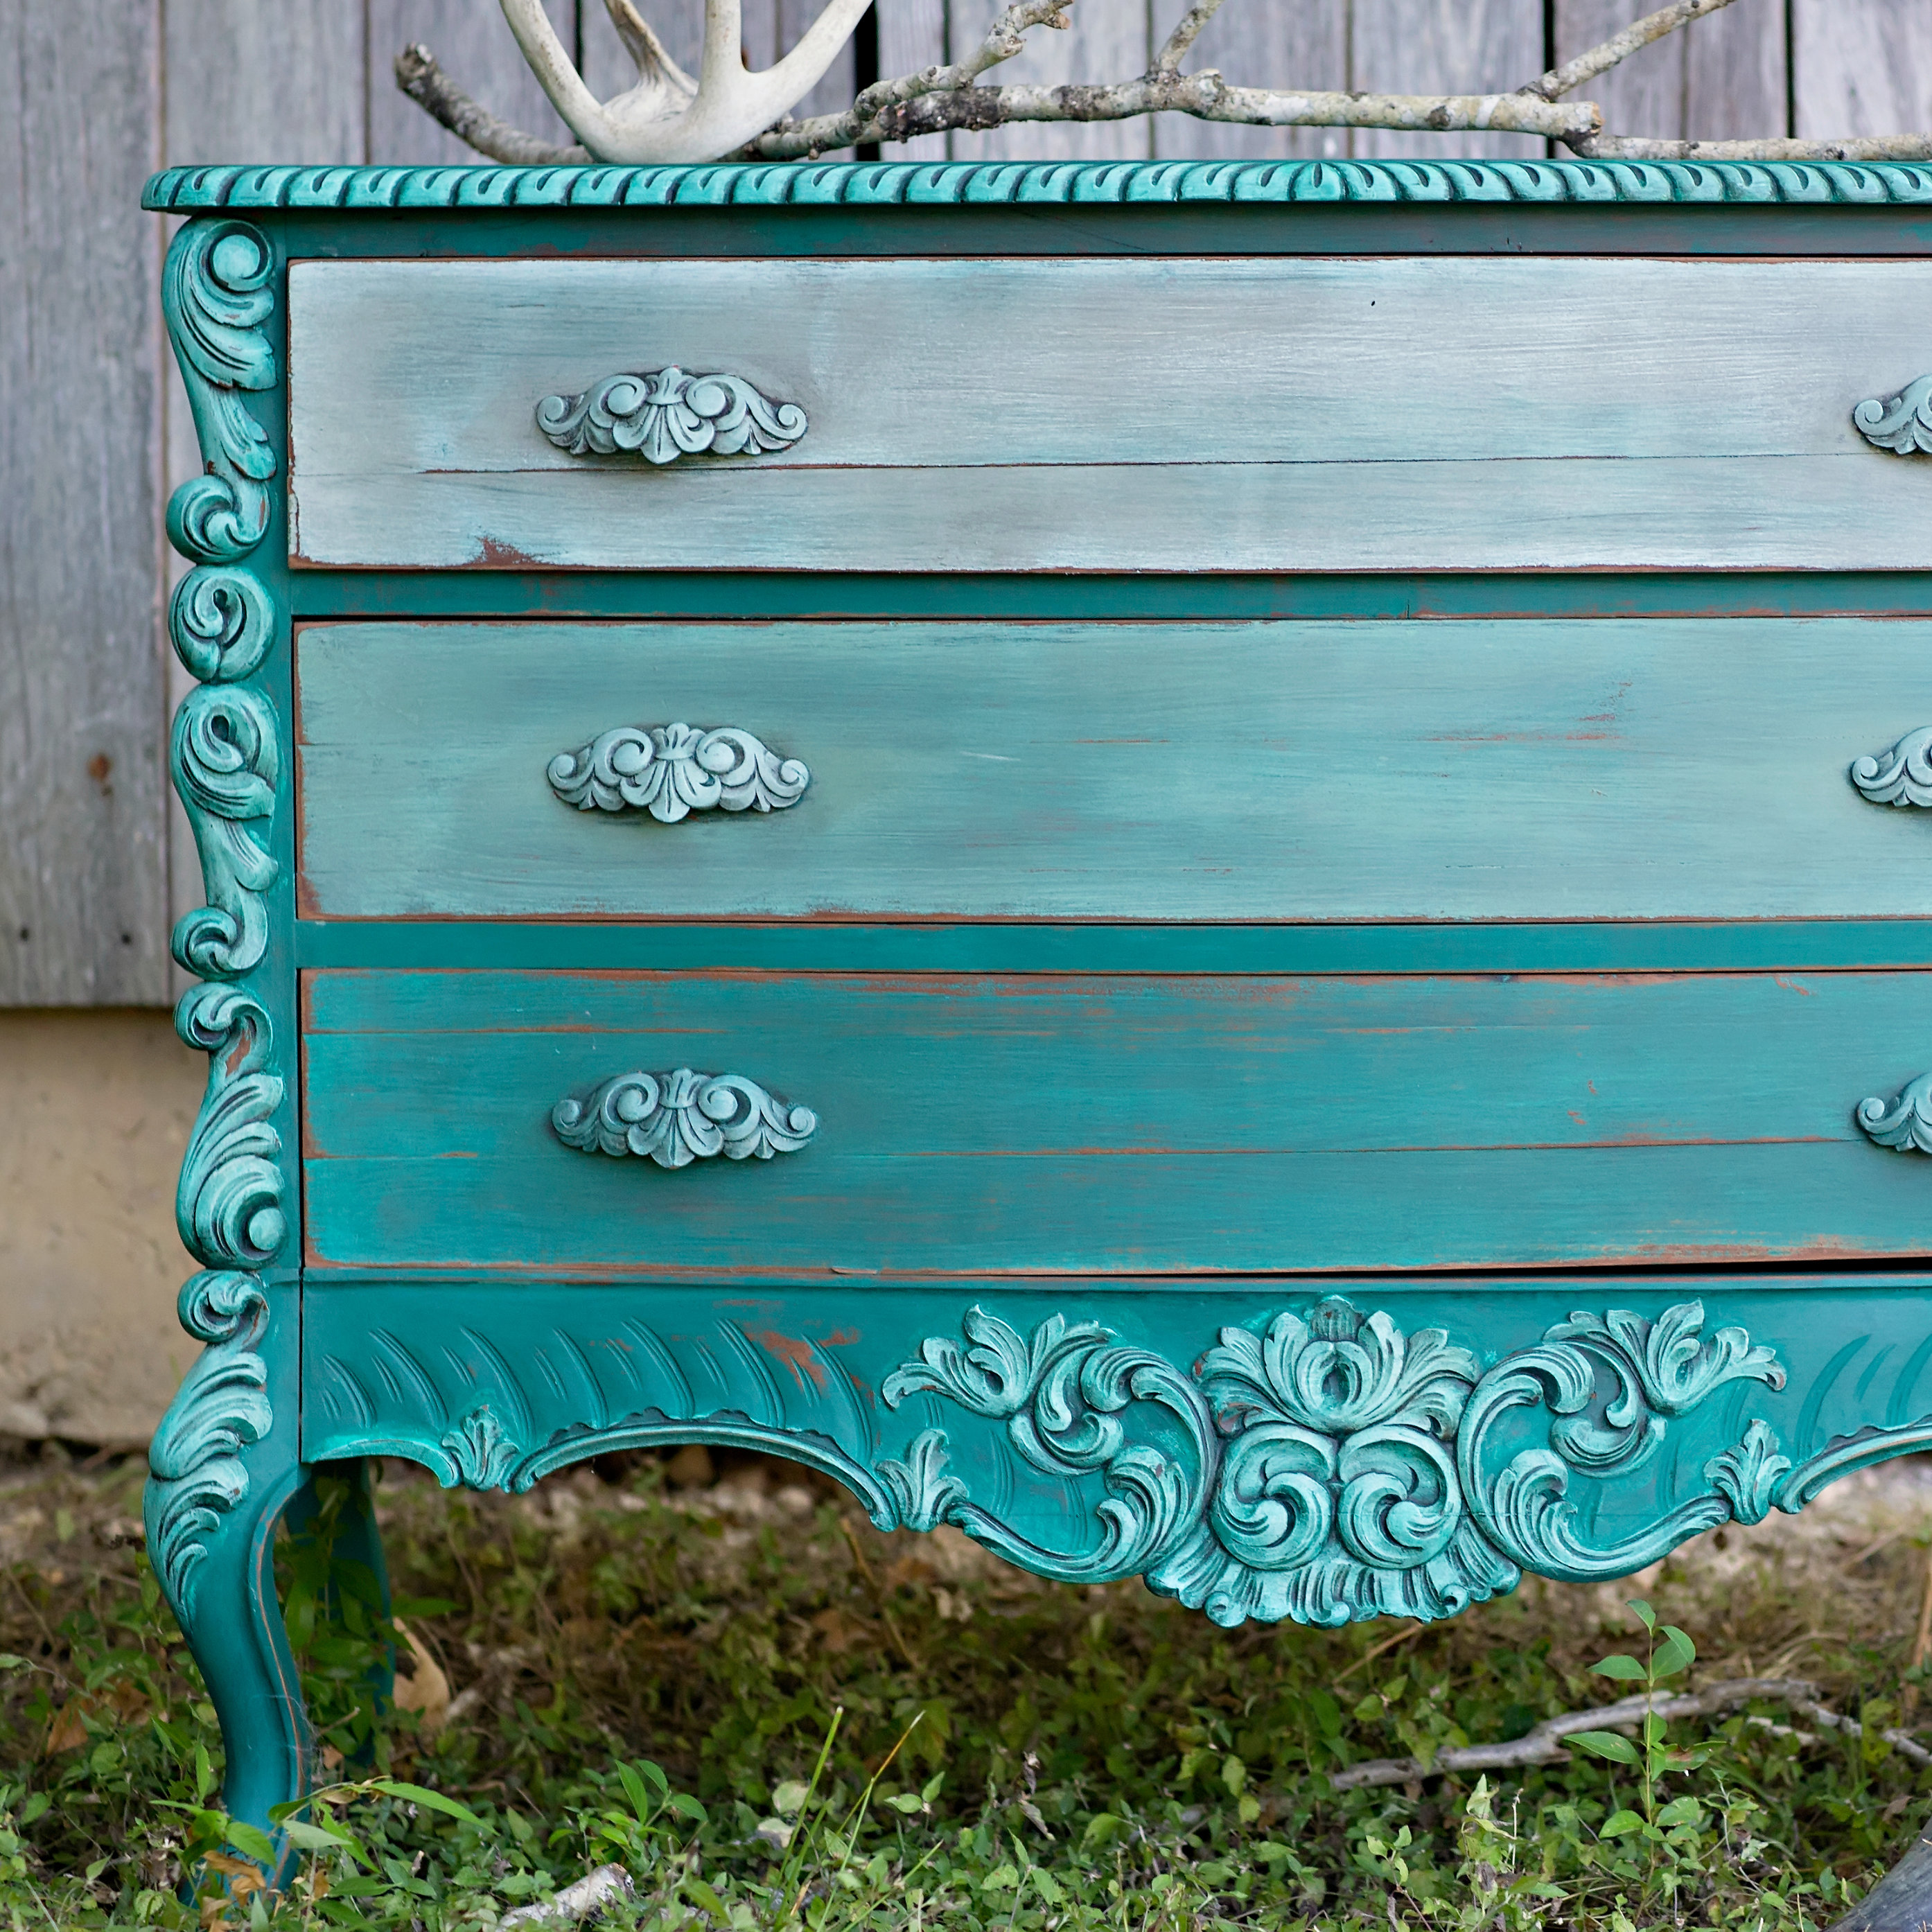 Farmhouse Color Wash Furniture Tutorial 00136